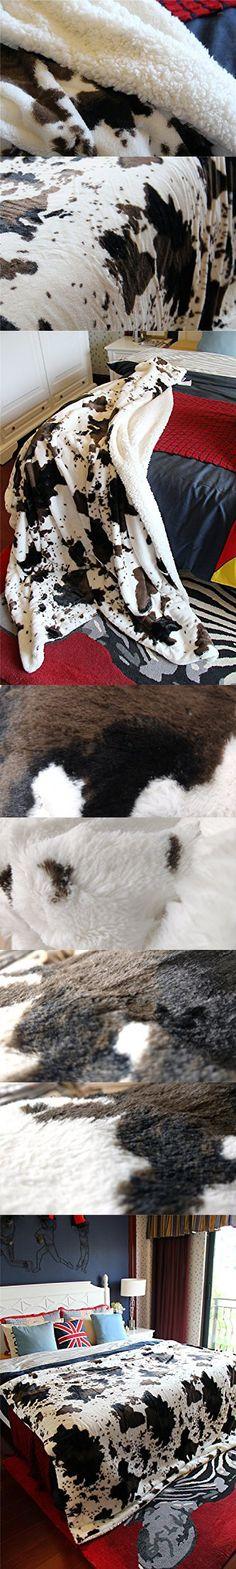 "DaDa Bedding Super Soft Warm Cow Print Sherpa Faux Fur Throw Blanket From Tache, 50"" x 60"""